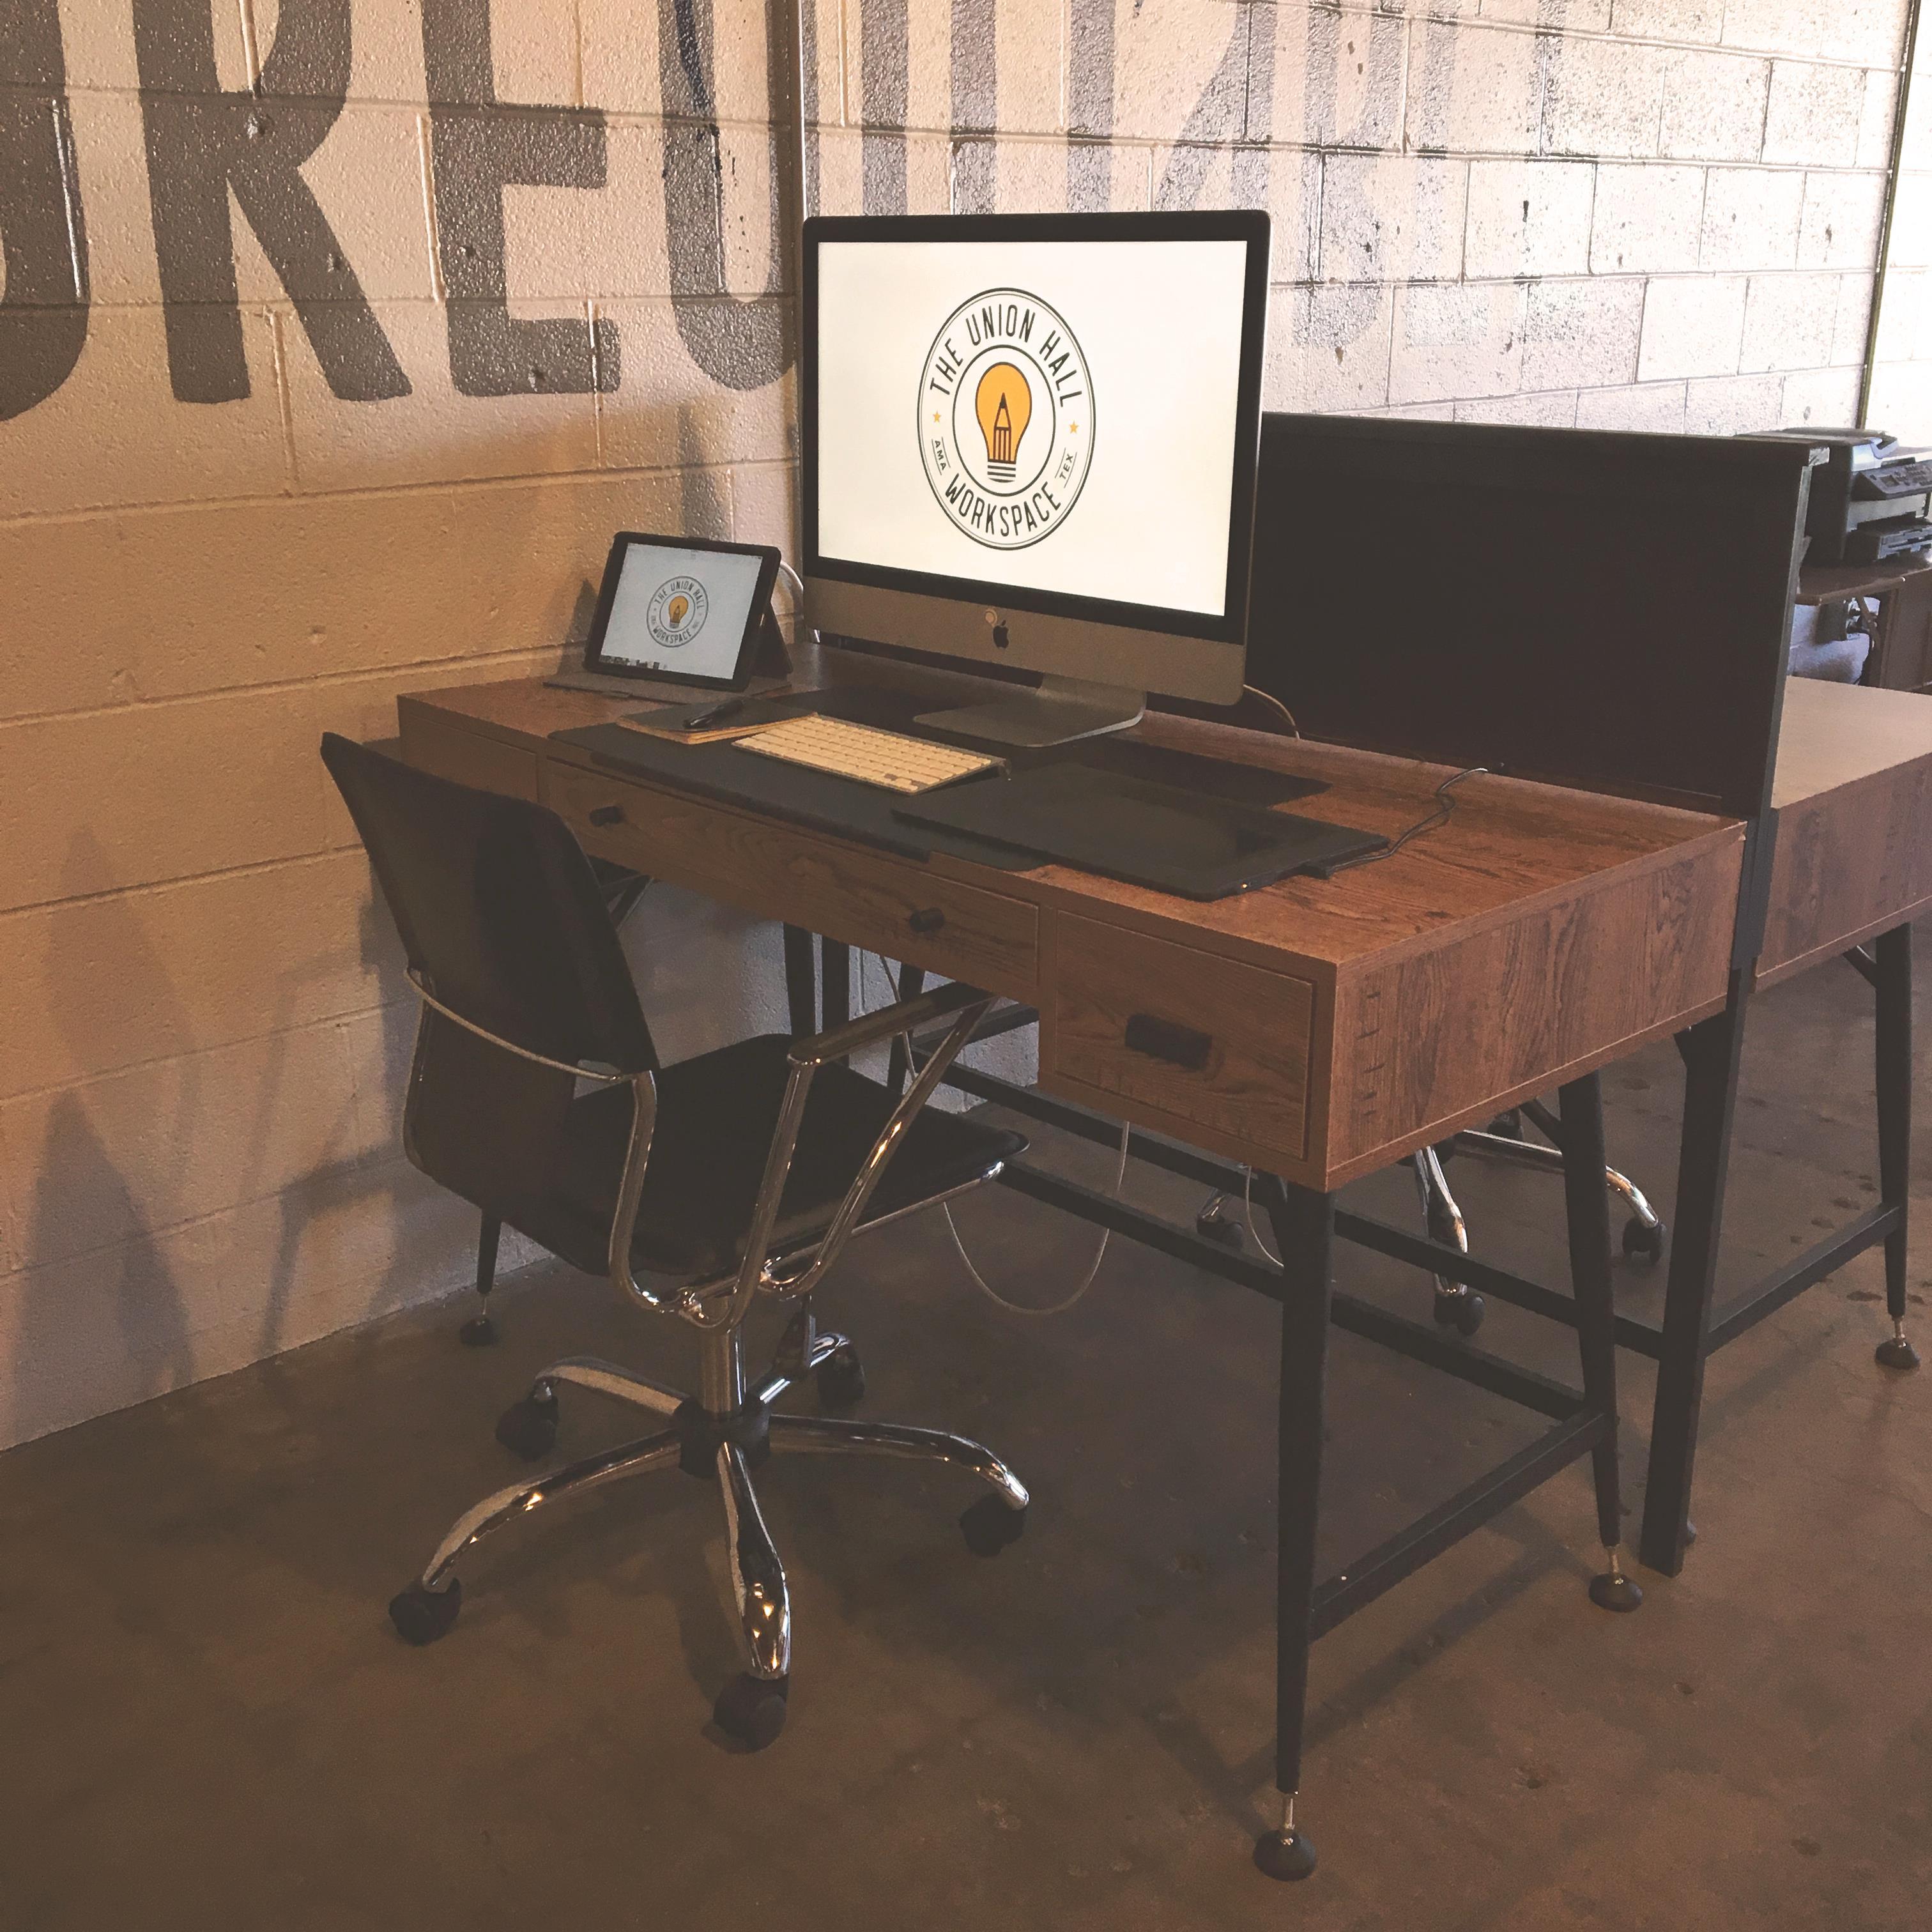 The Union Hall Workspace - Dedicated Desk